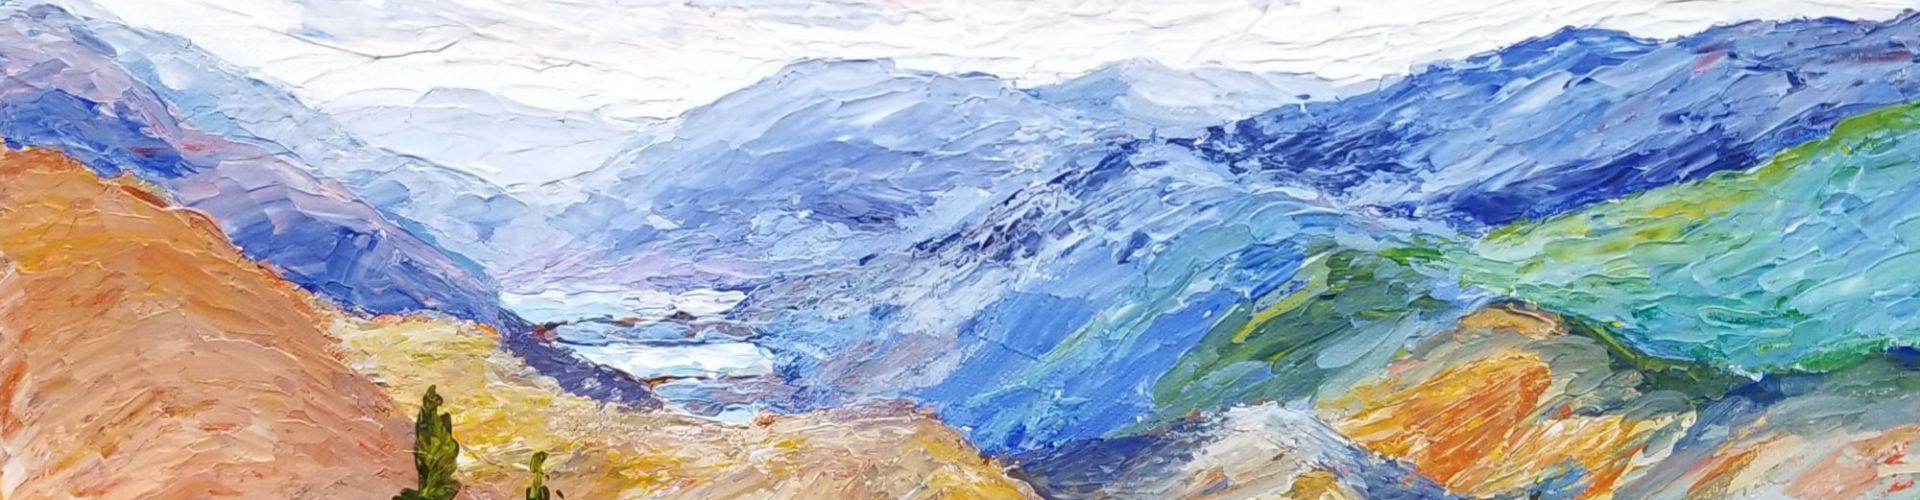 Valley View painting by Linda Lovisa